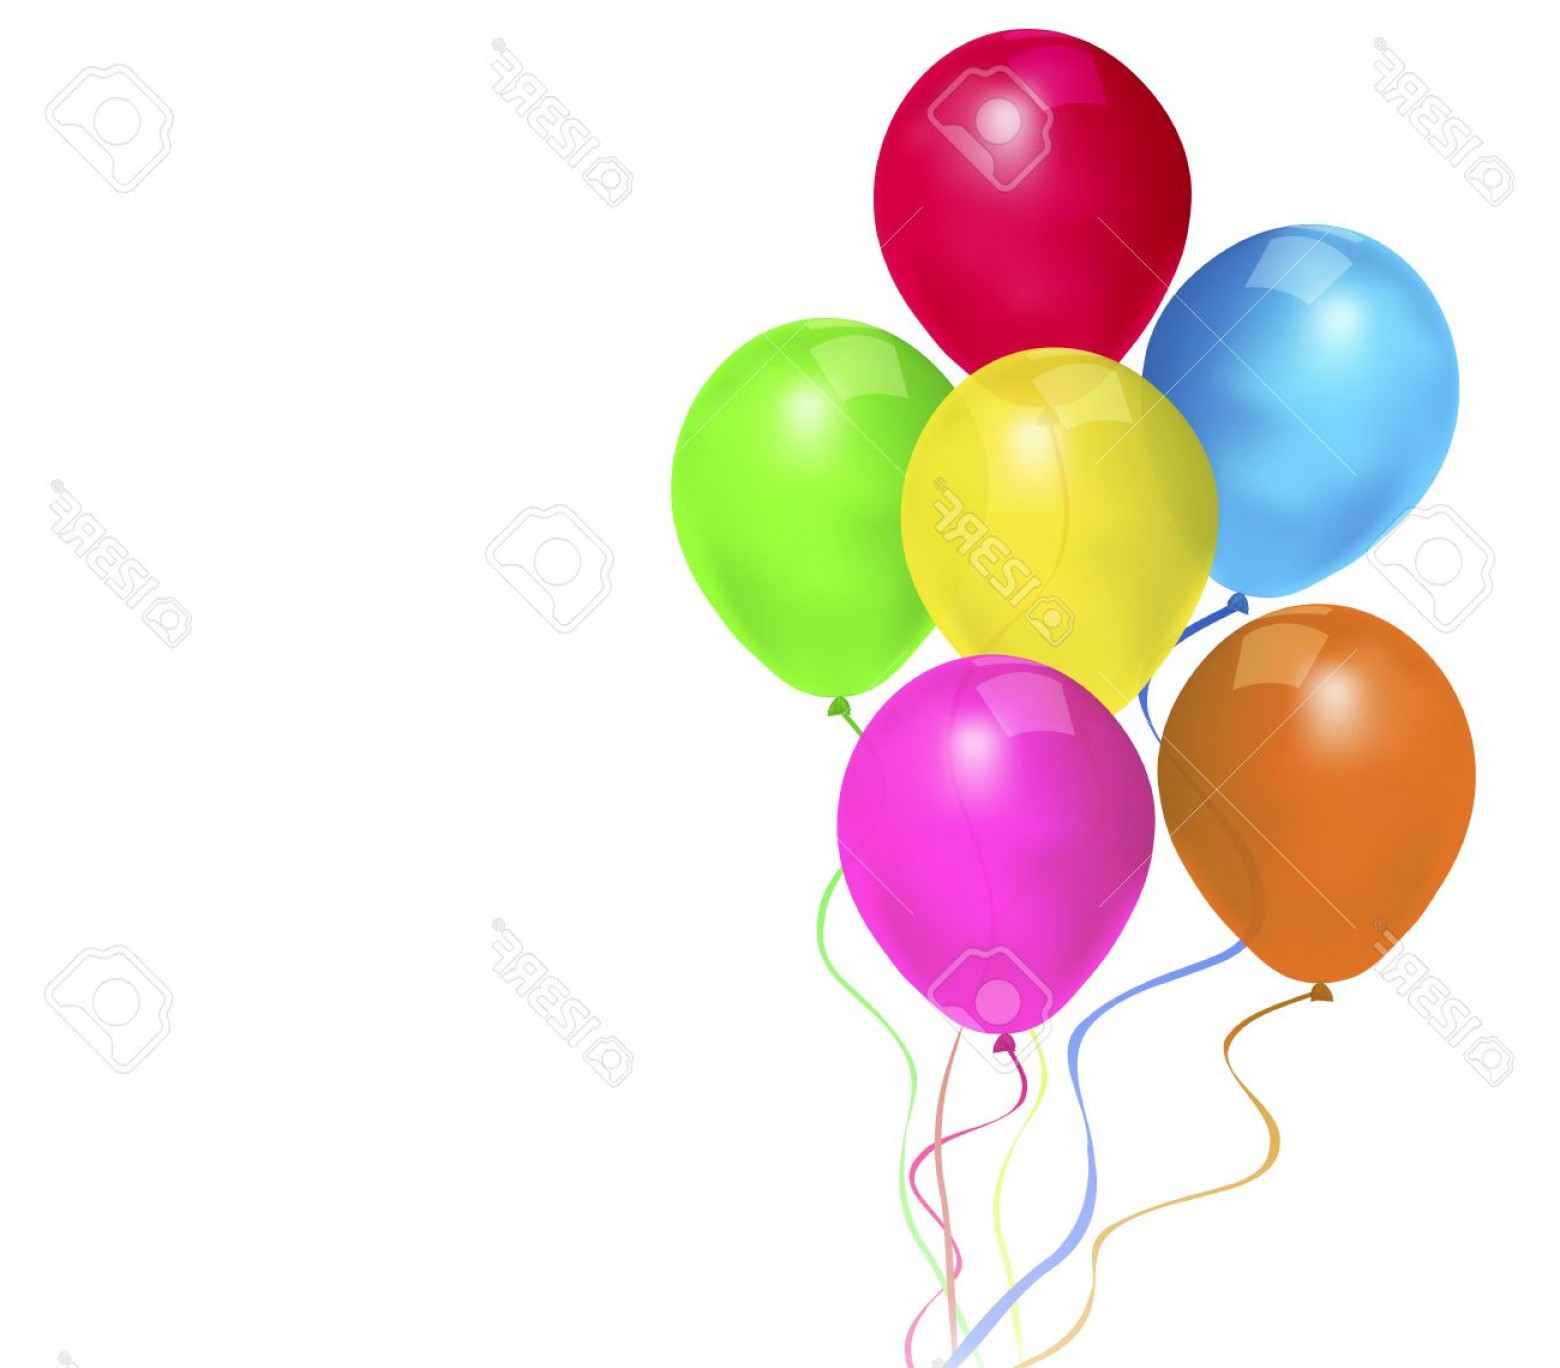 1560x1368 Photostock Vector Festive Balloons Vector Art Illustration Of A